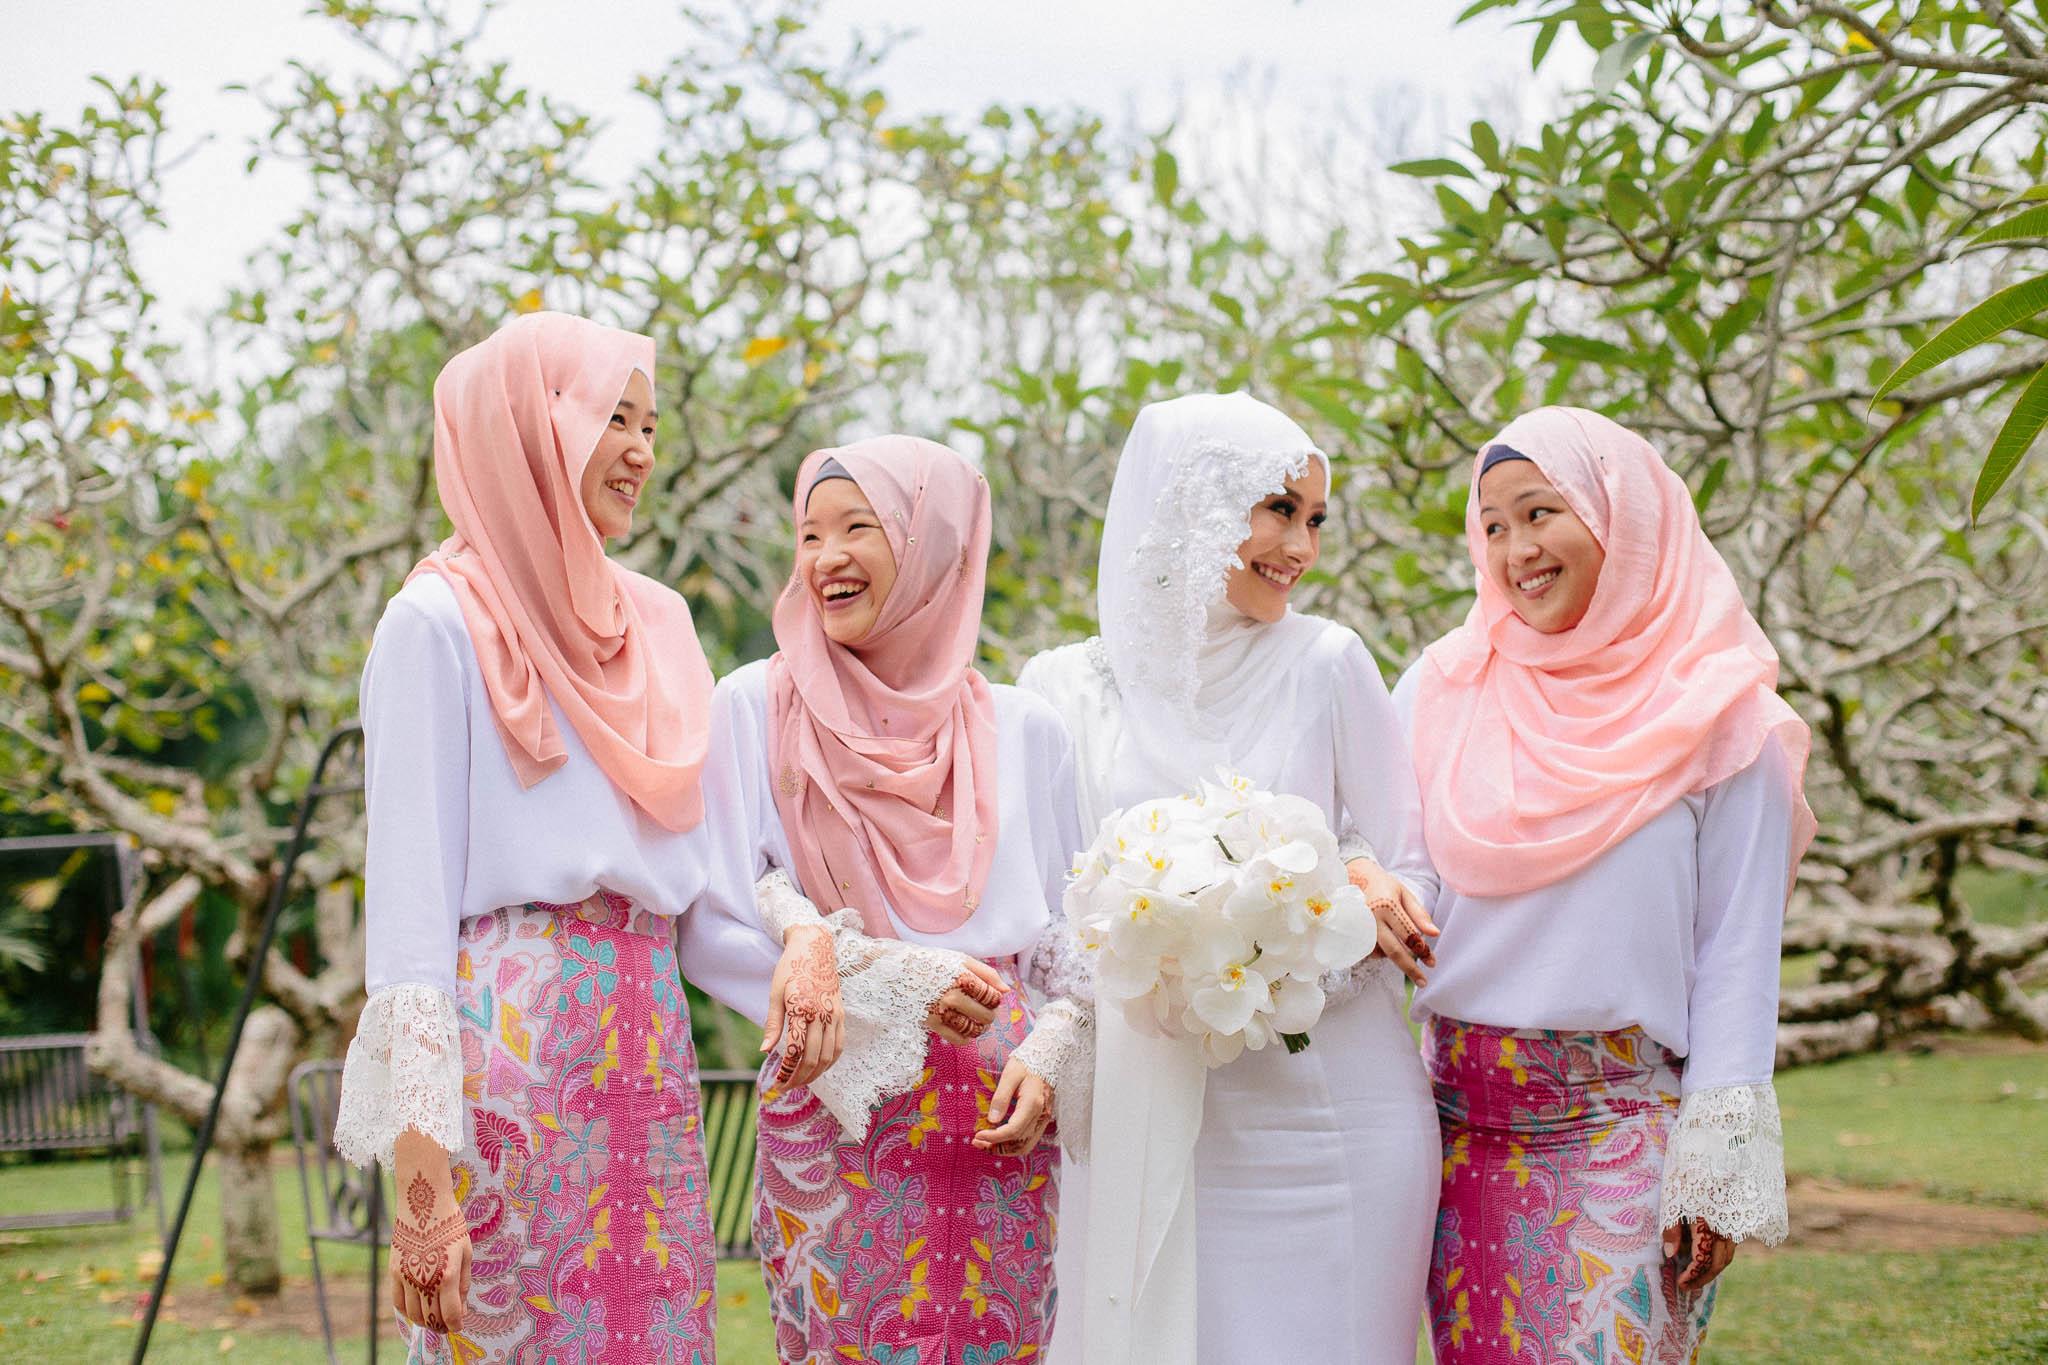 singapore-wedding-photographer-sarah-razif-64.jpg